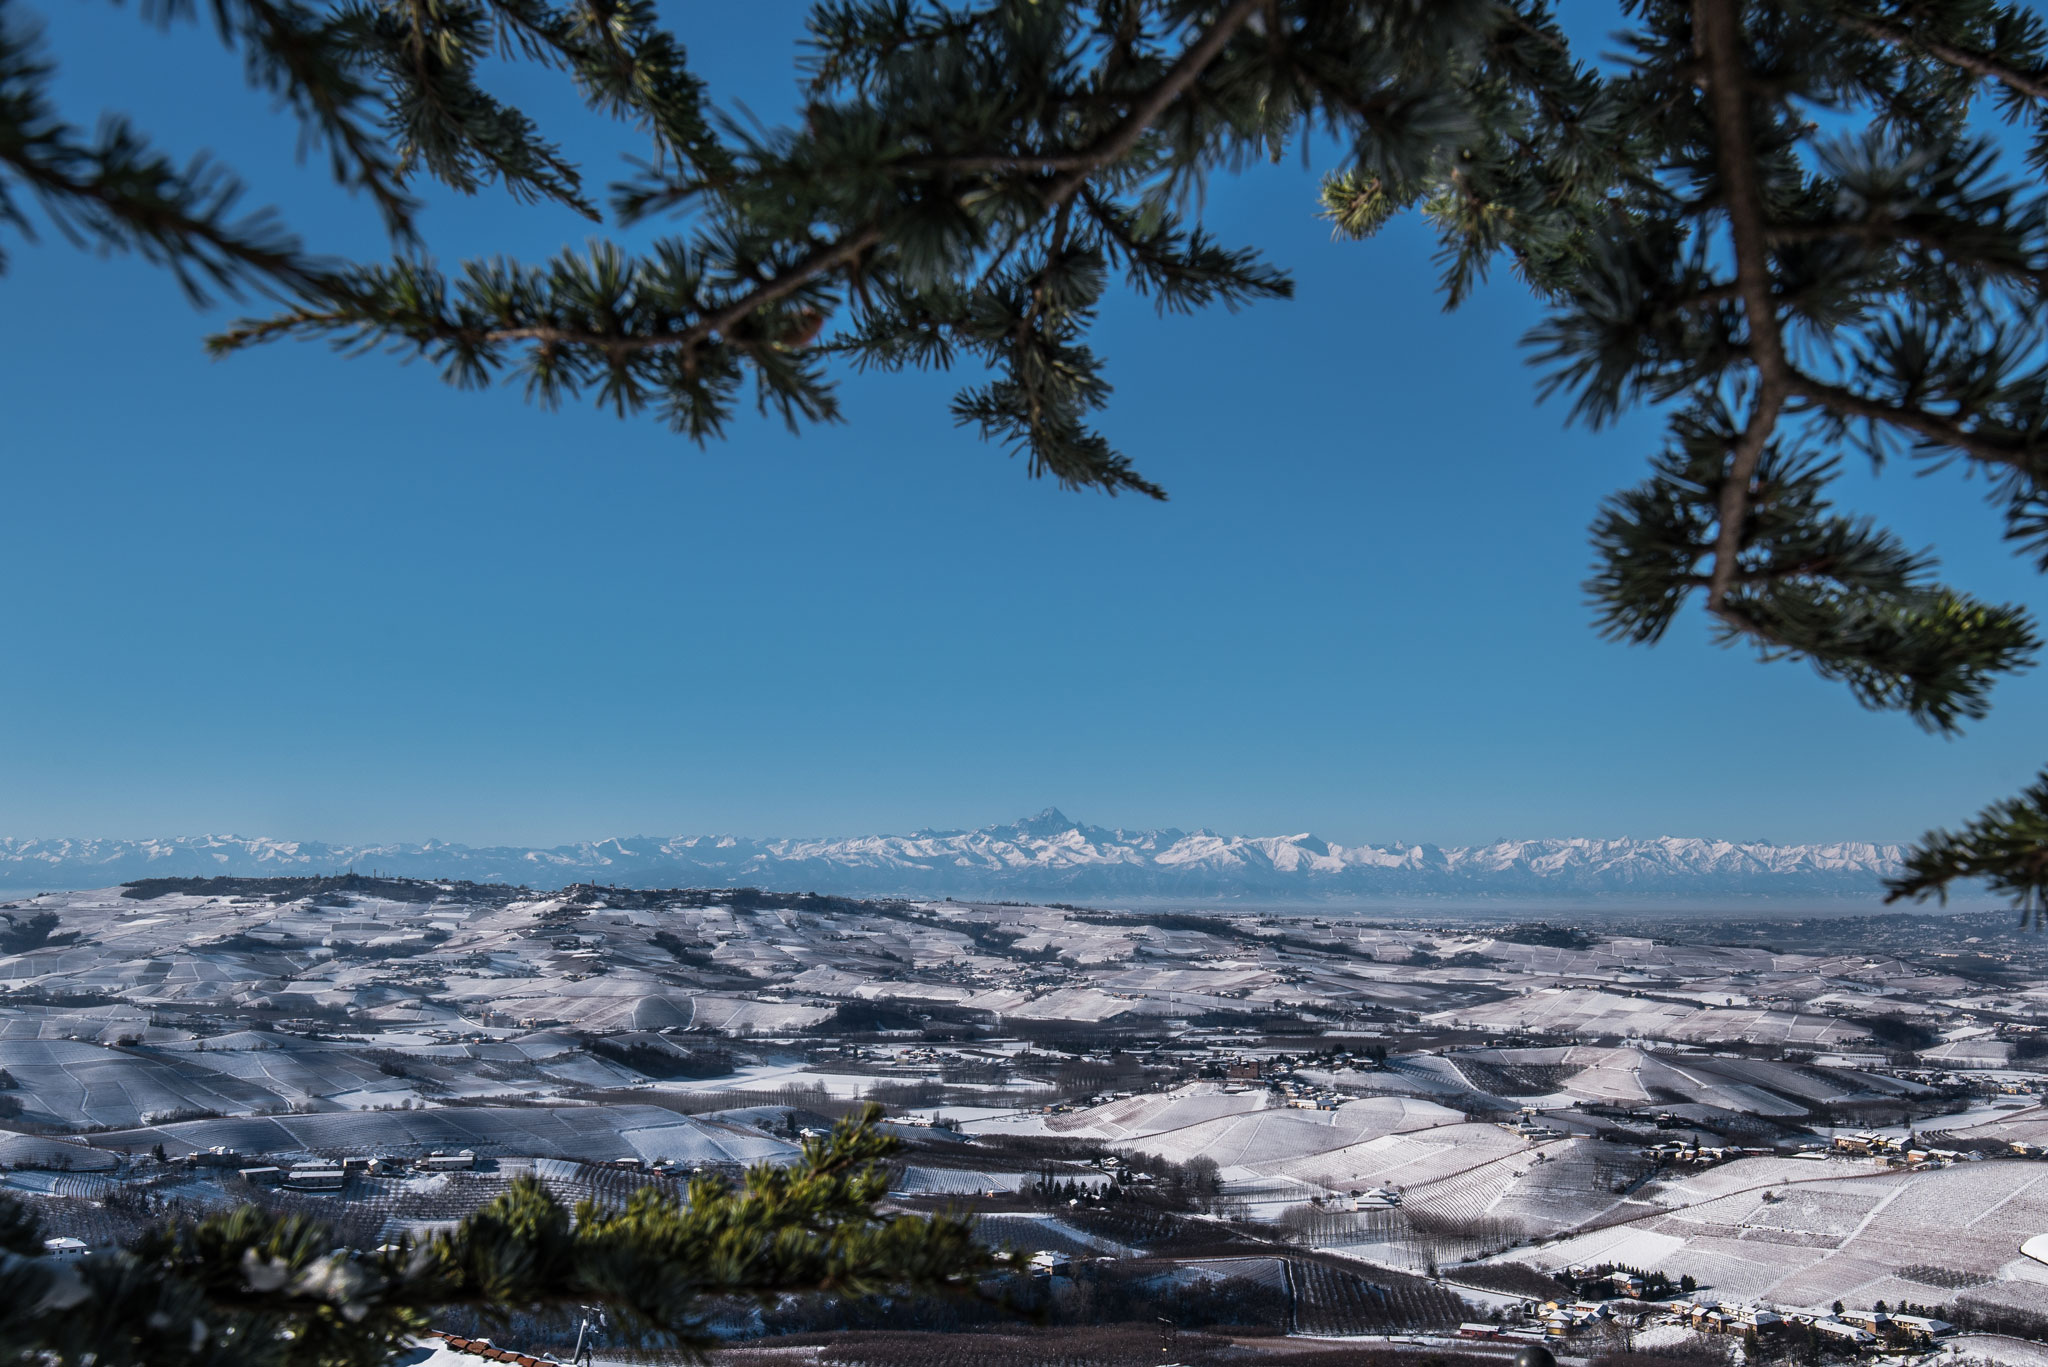 Paesaggi-Italia - Emanuele Tibaldi Fotografo Langhe - Langhe d'inverno- Langhe innevate - Langhe d'inverno- Langhe innevate